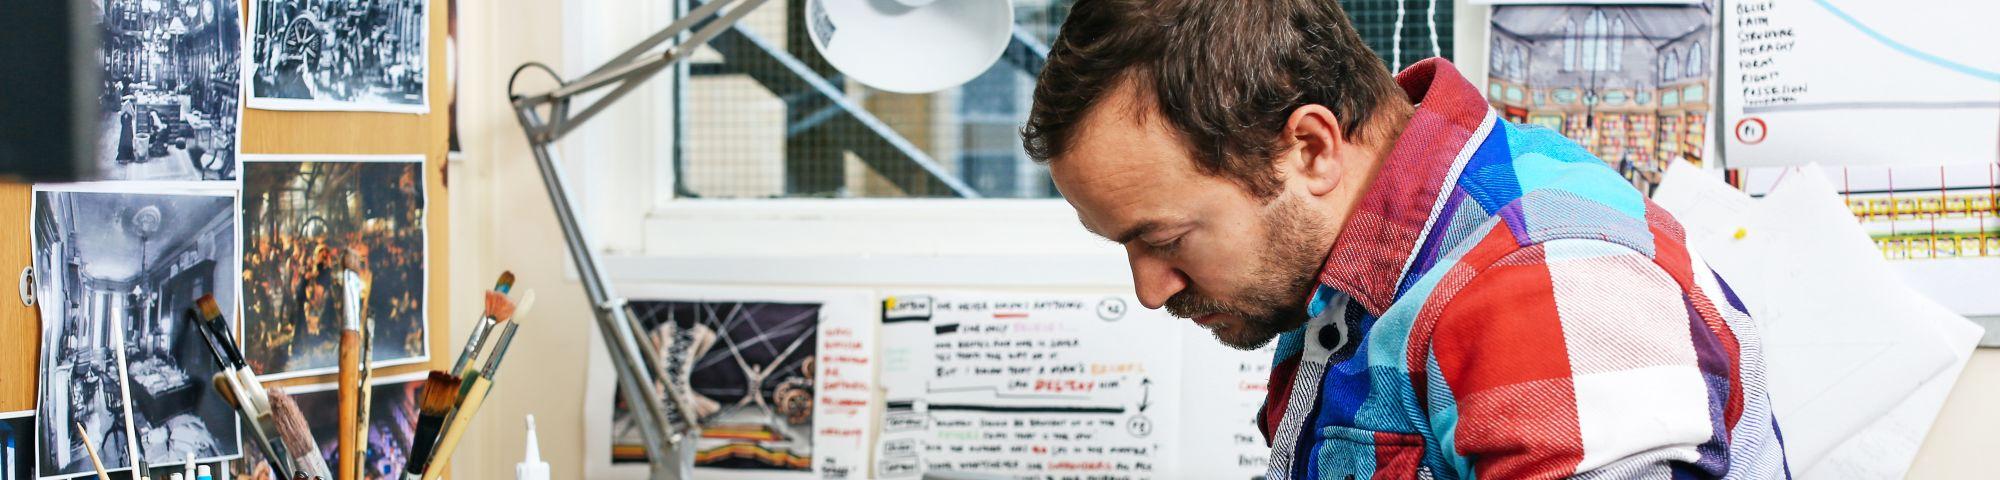 Yoav Segal working in his studio